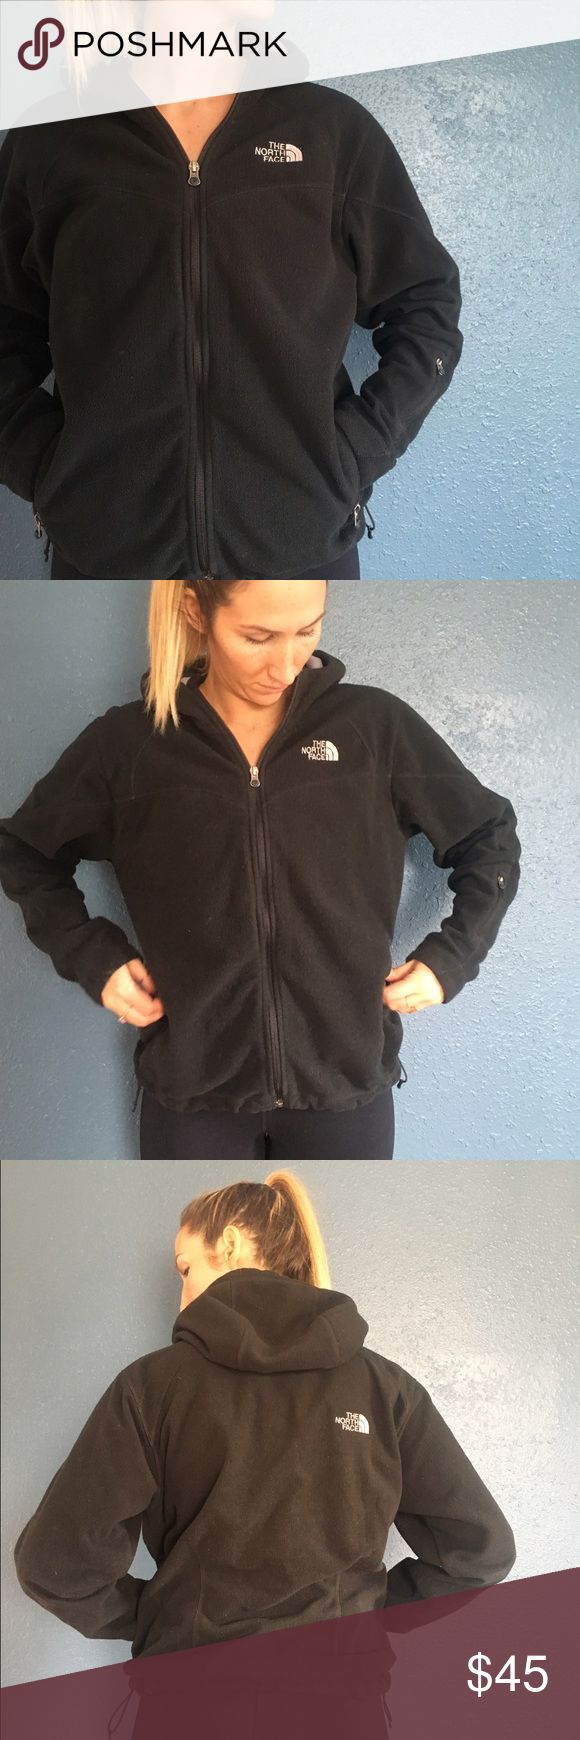 Black North Face zip up hooded Fleecr sz L Womens Black North Face zip up hooded fleece with zip pockets! Definitely worn, but still looks good. North Face Jackets & Coats